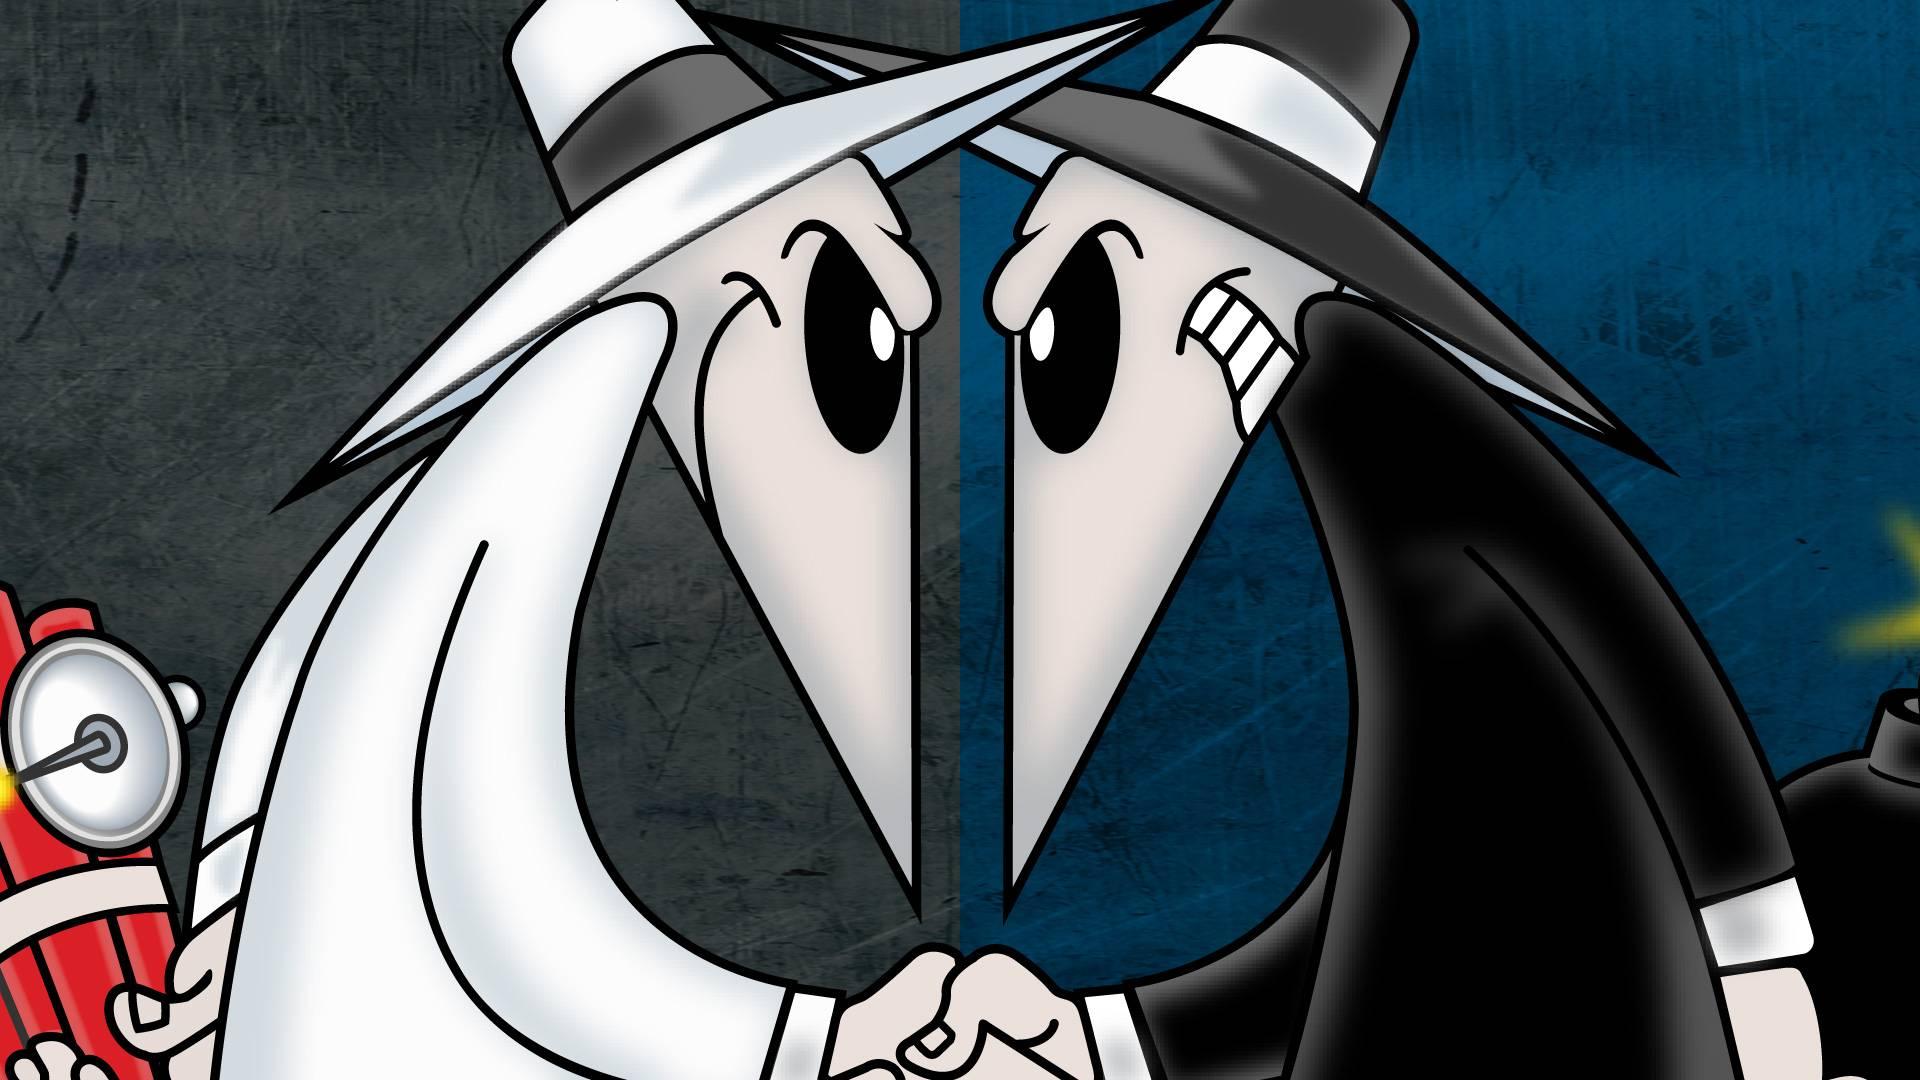 Free Download Spy Vs Spy Dual Monitor Hd Friendly Wallpapers